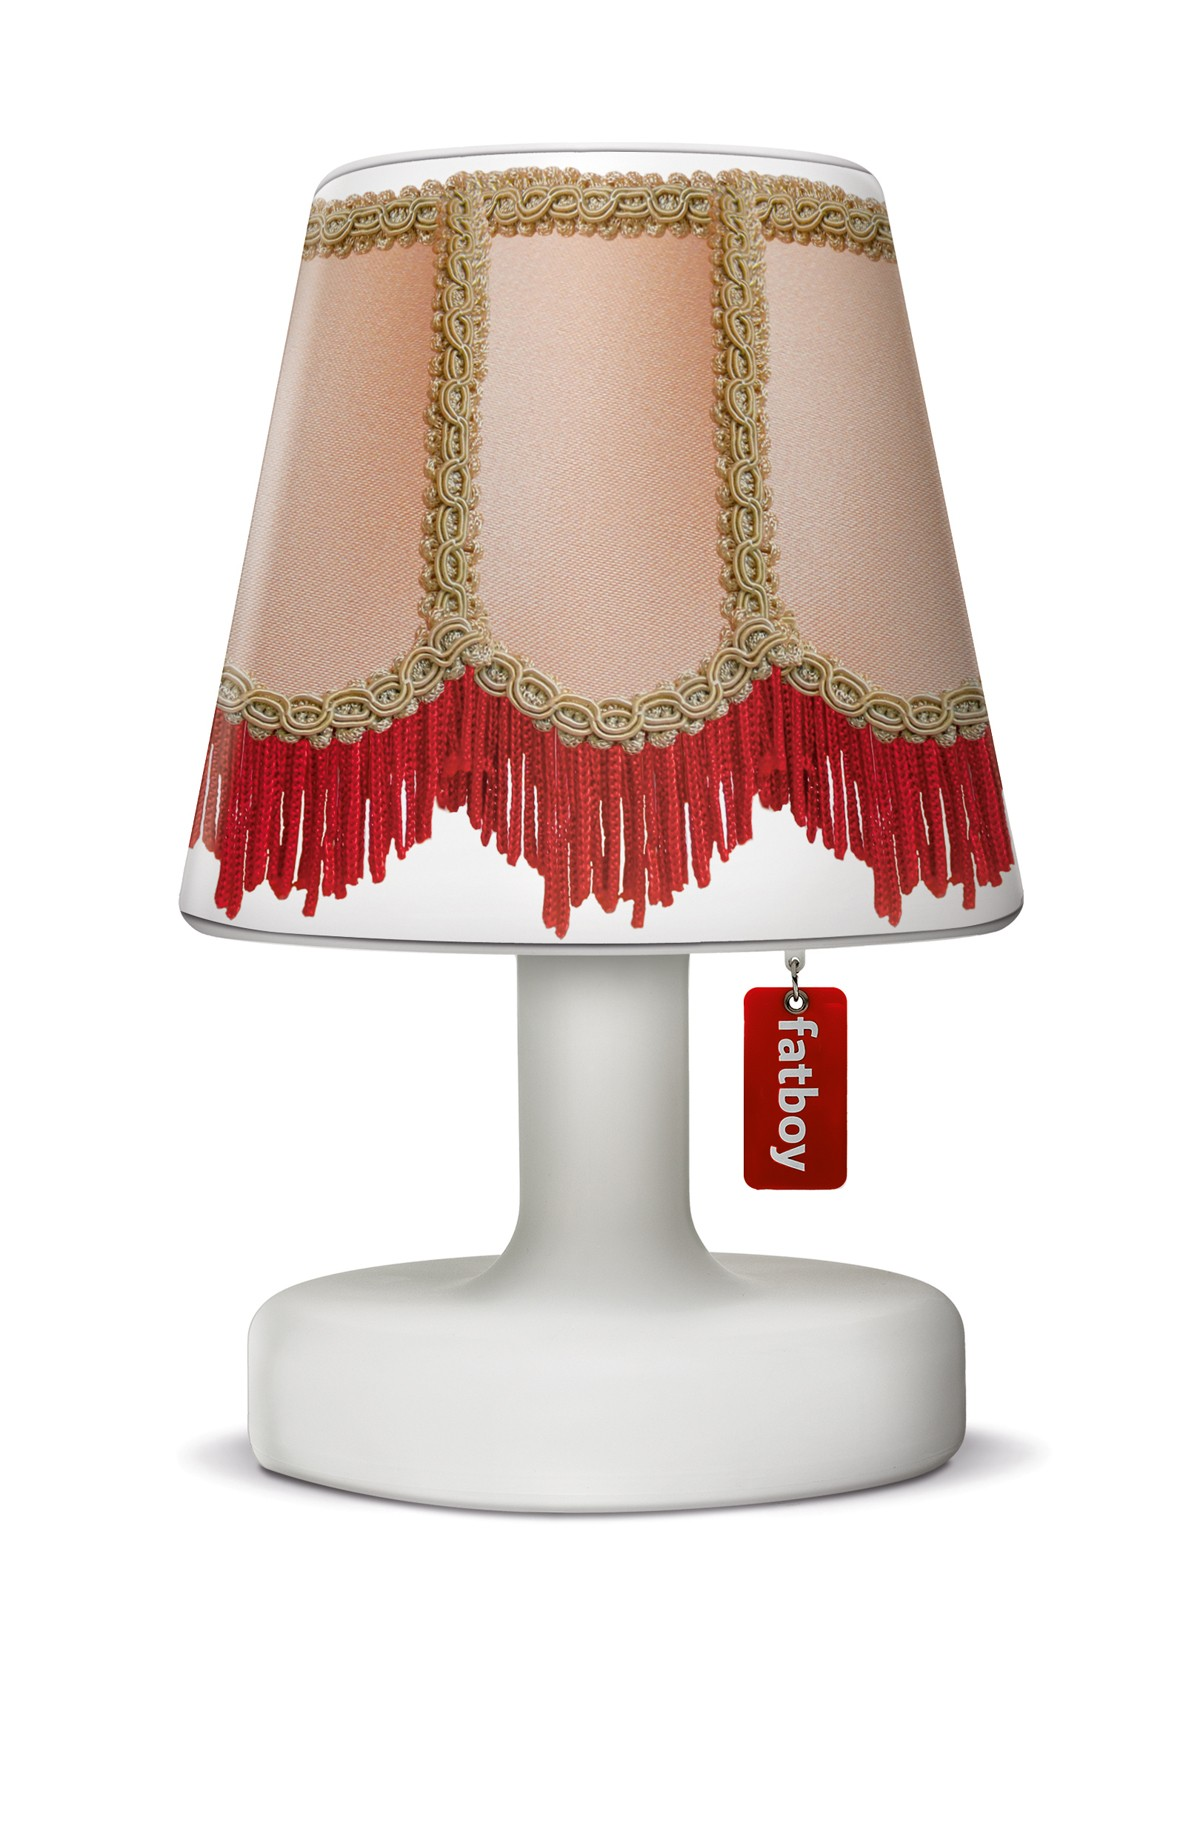 lampe edison the petit granny de fatboy. Black Bedroom Furniture Sets. Home Design Ideas